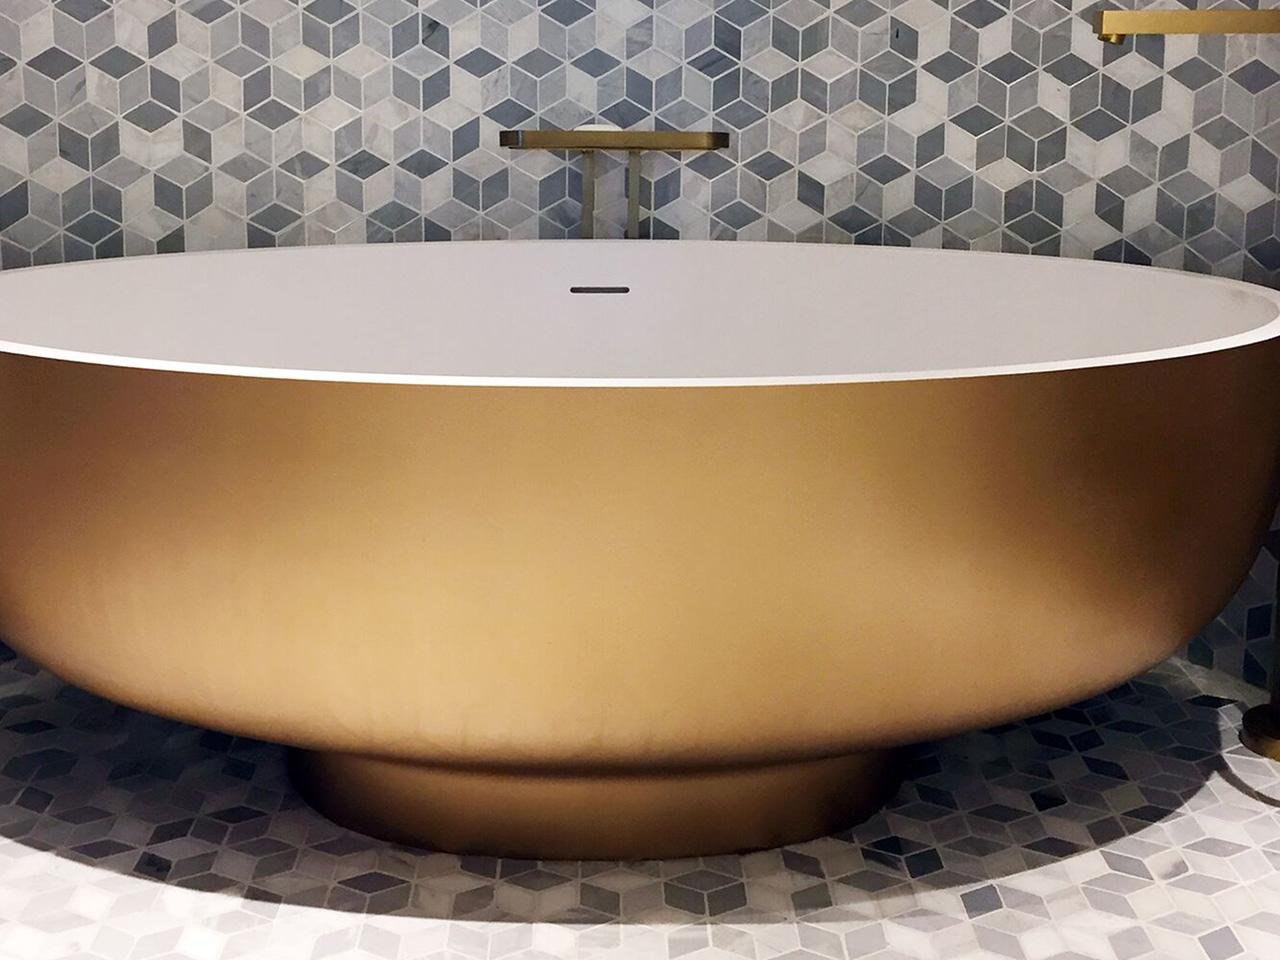 Viceroy The Palm gold bath